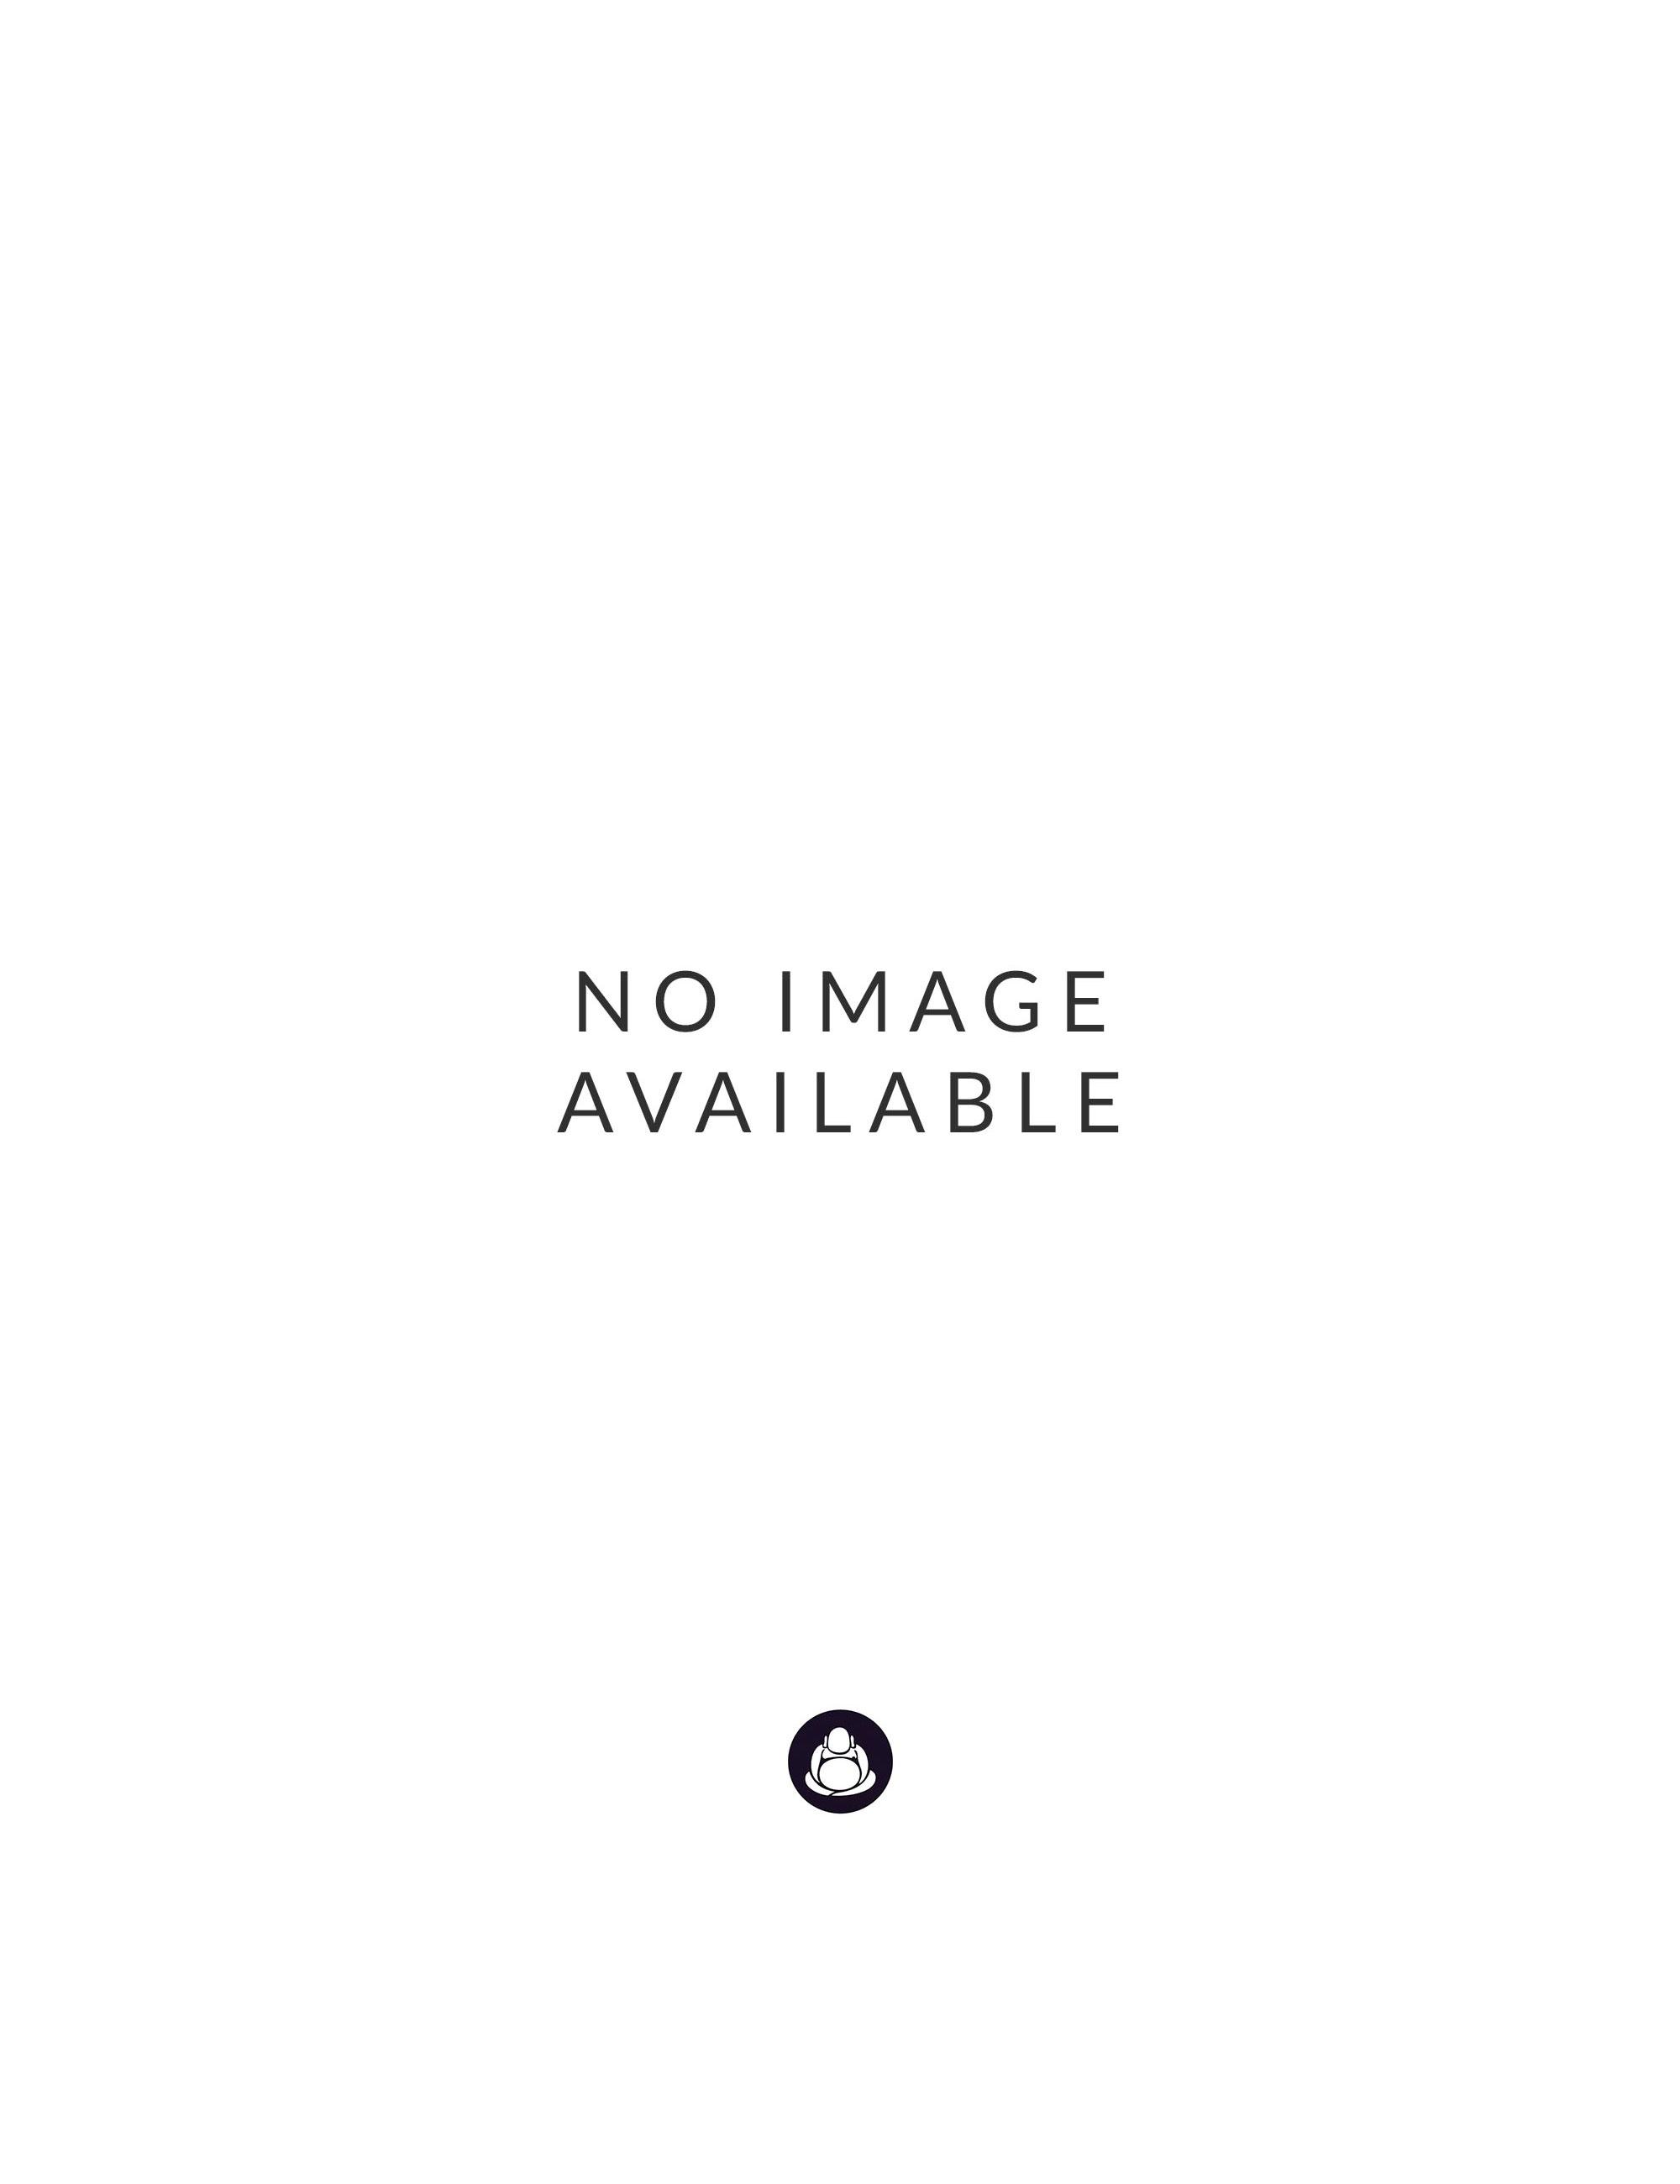 Proraso Pre Shave Cream Jar - Sensitive Skin (100ml)